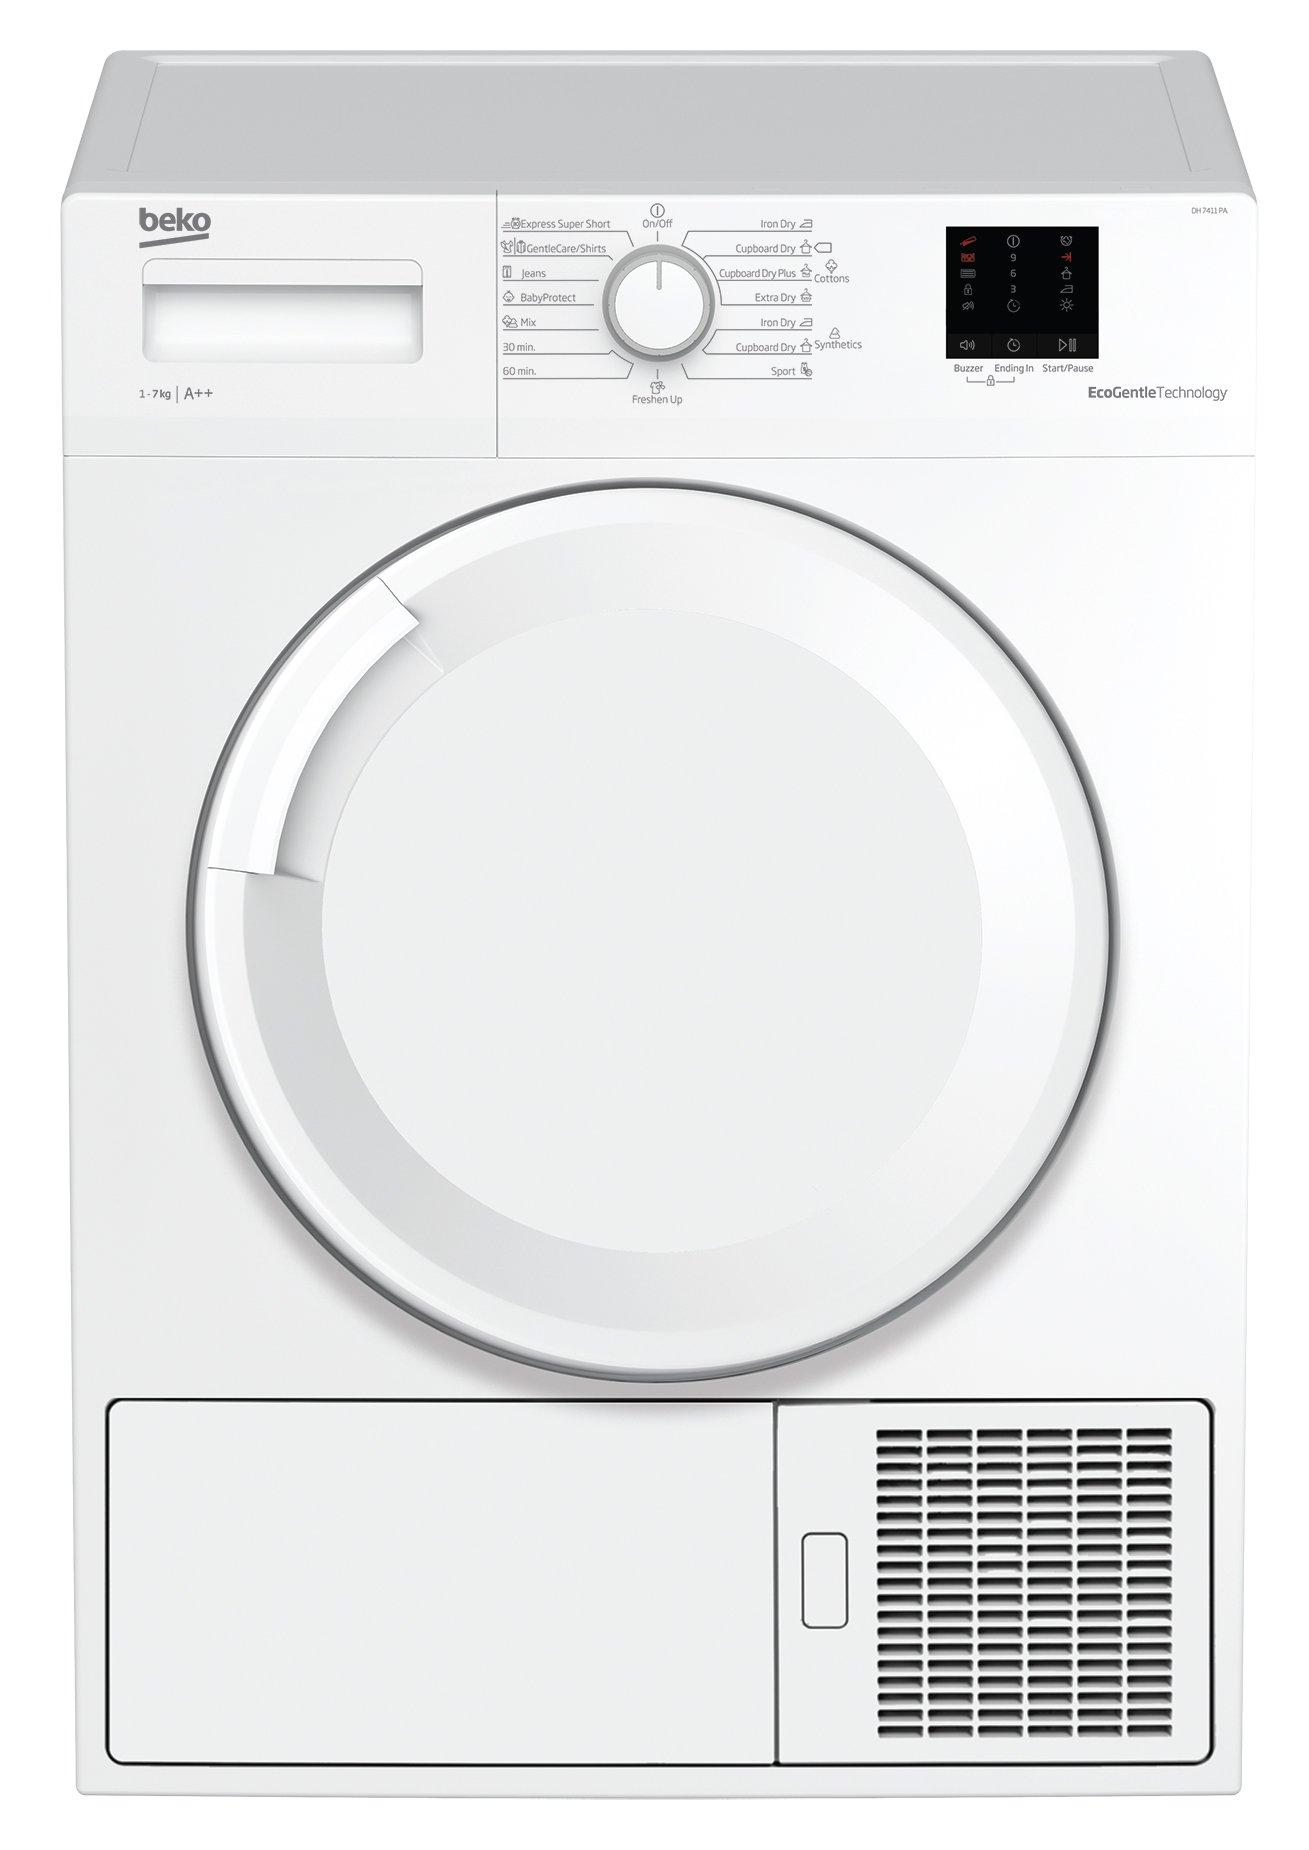 Beko DS7511PA Wärmepumpentrockner, Kondenstrockner, 7 kg, Knitterschutz, FlexySense